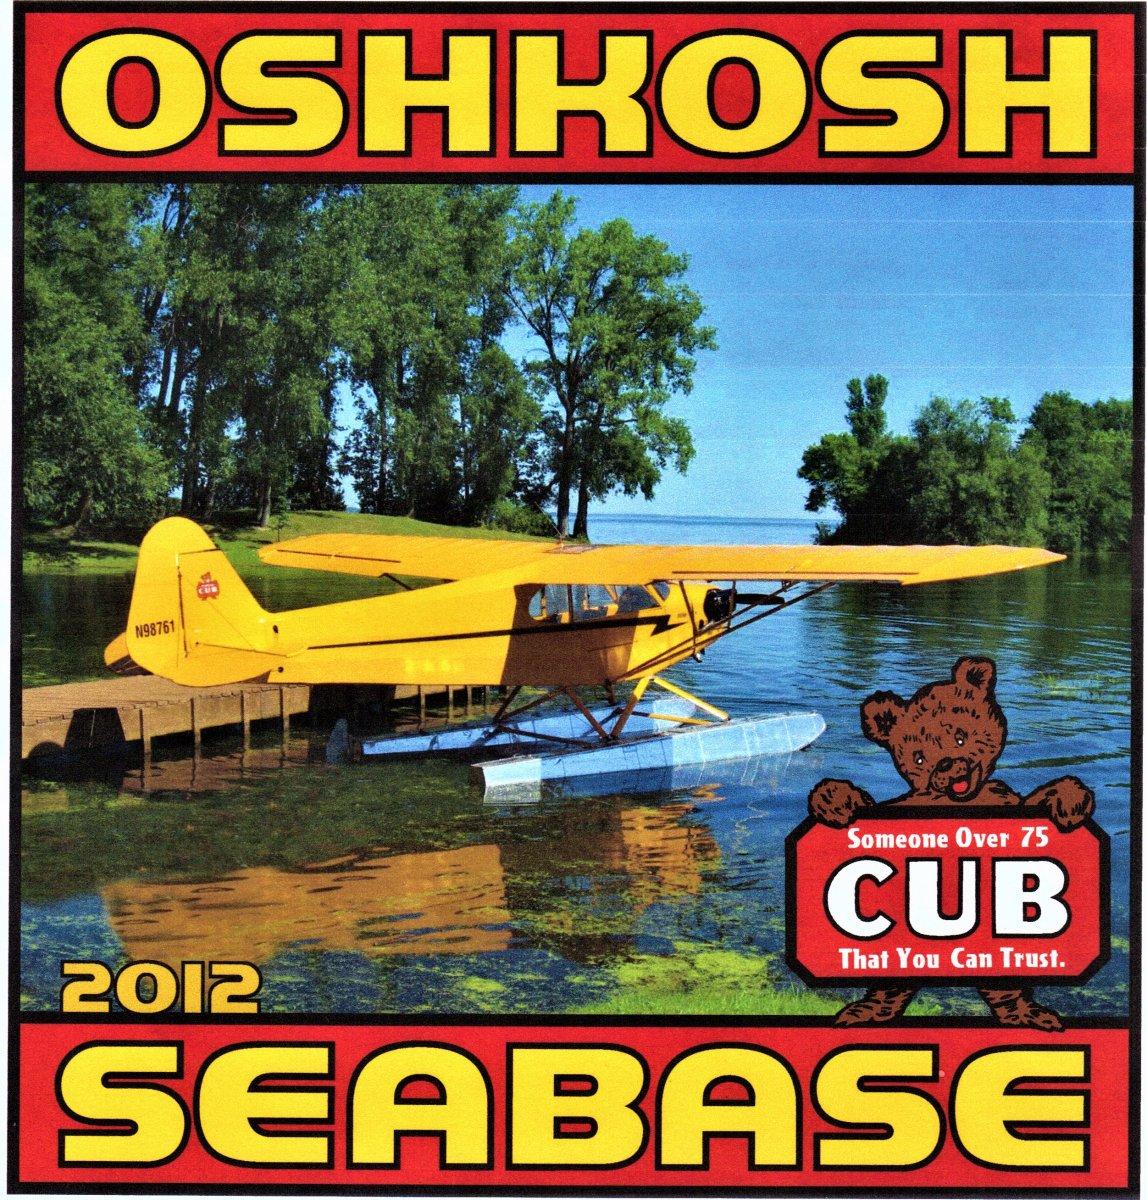 oshkosh 2012 cub final (2).JPG